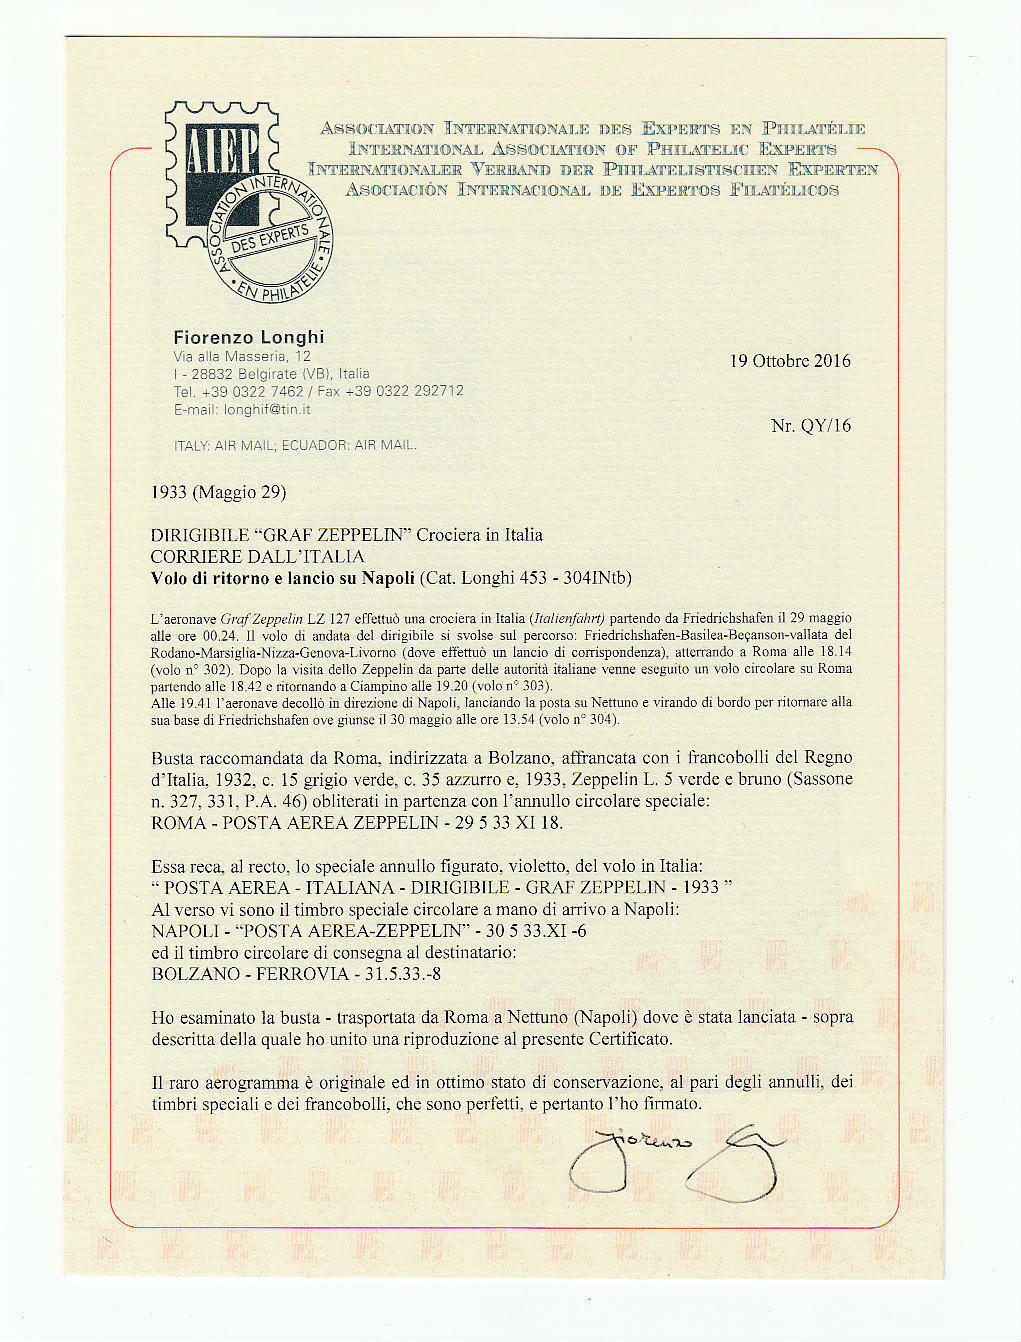 Lot 2427 - REGNO D'ITALIA Individual lots -  Ponte Auction House Stamps Auction 505